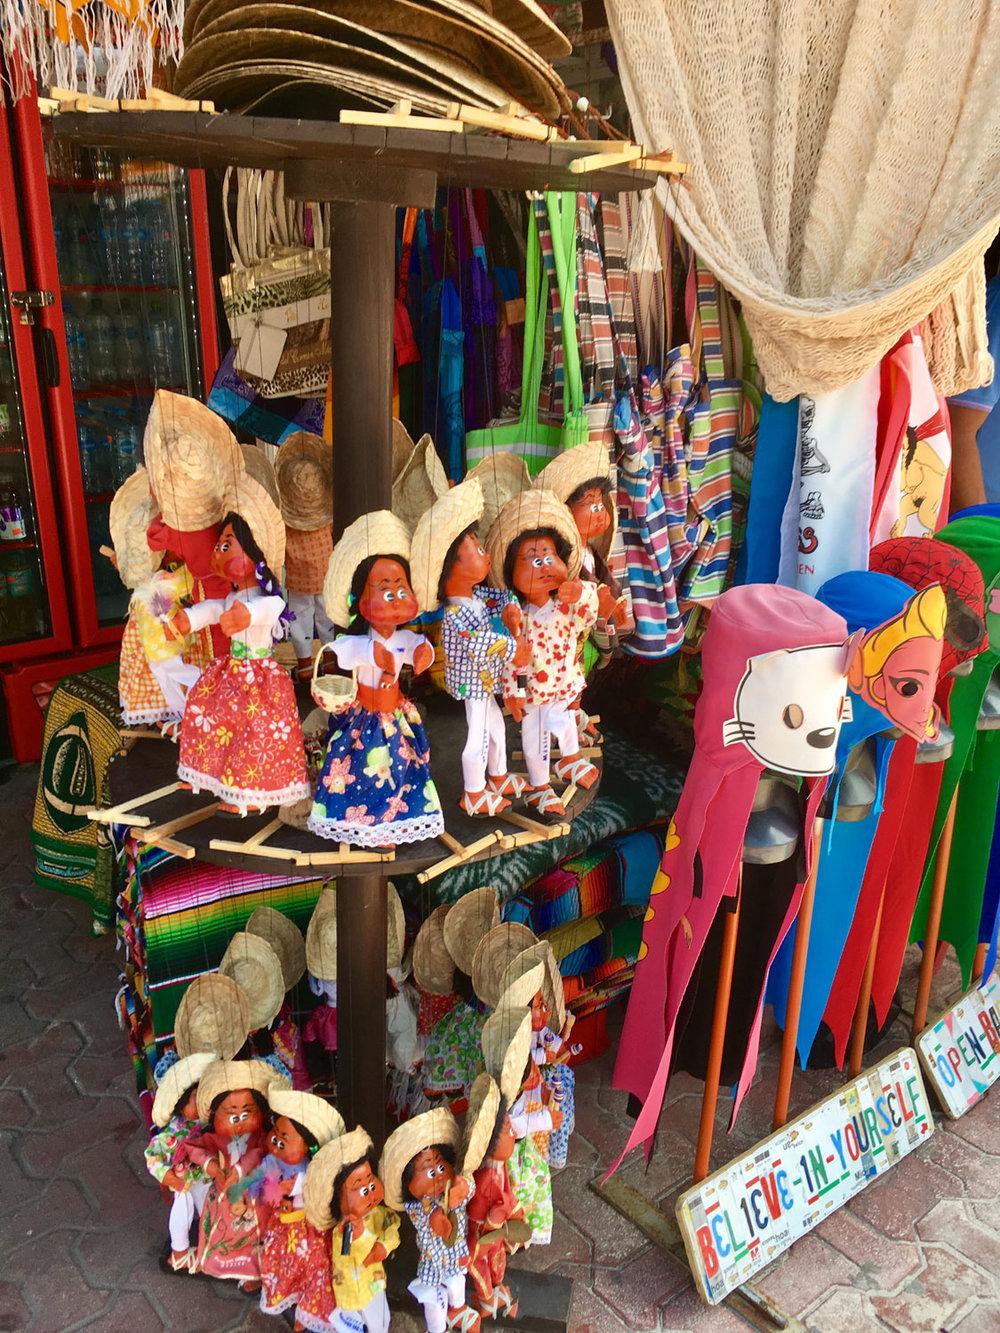 Hammocks_and_Ruins_Blog_Riviera_Maya_Mexico_Travel_Discover_Explore_What_to_do_Playa_del_Carmen_63.jpg